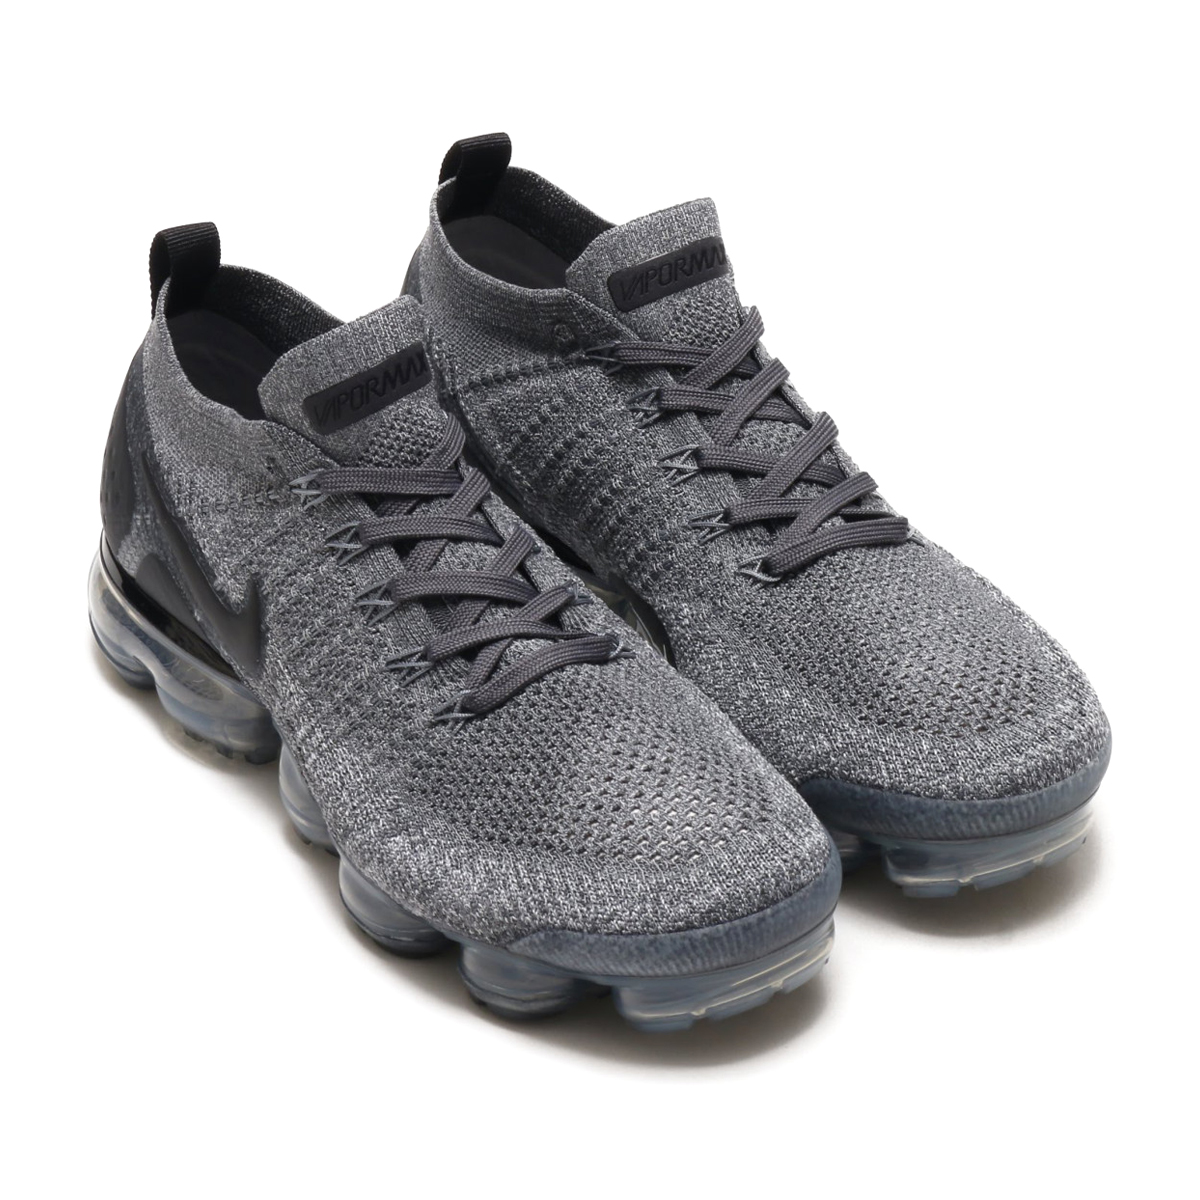 meet 06734 404b3 NIKE AIR VAPORMAX FLYKNIT 2 (Nike air vapor max fried food knit 2) DARK  GREY/BLACK-WOLF GREY-BLACK 18SS-S